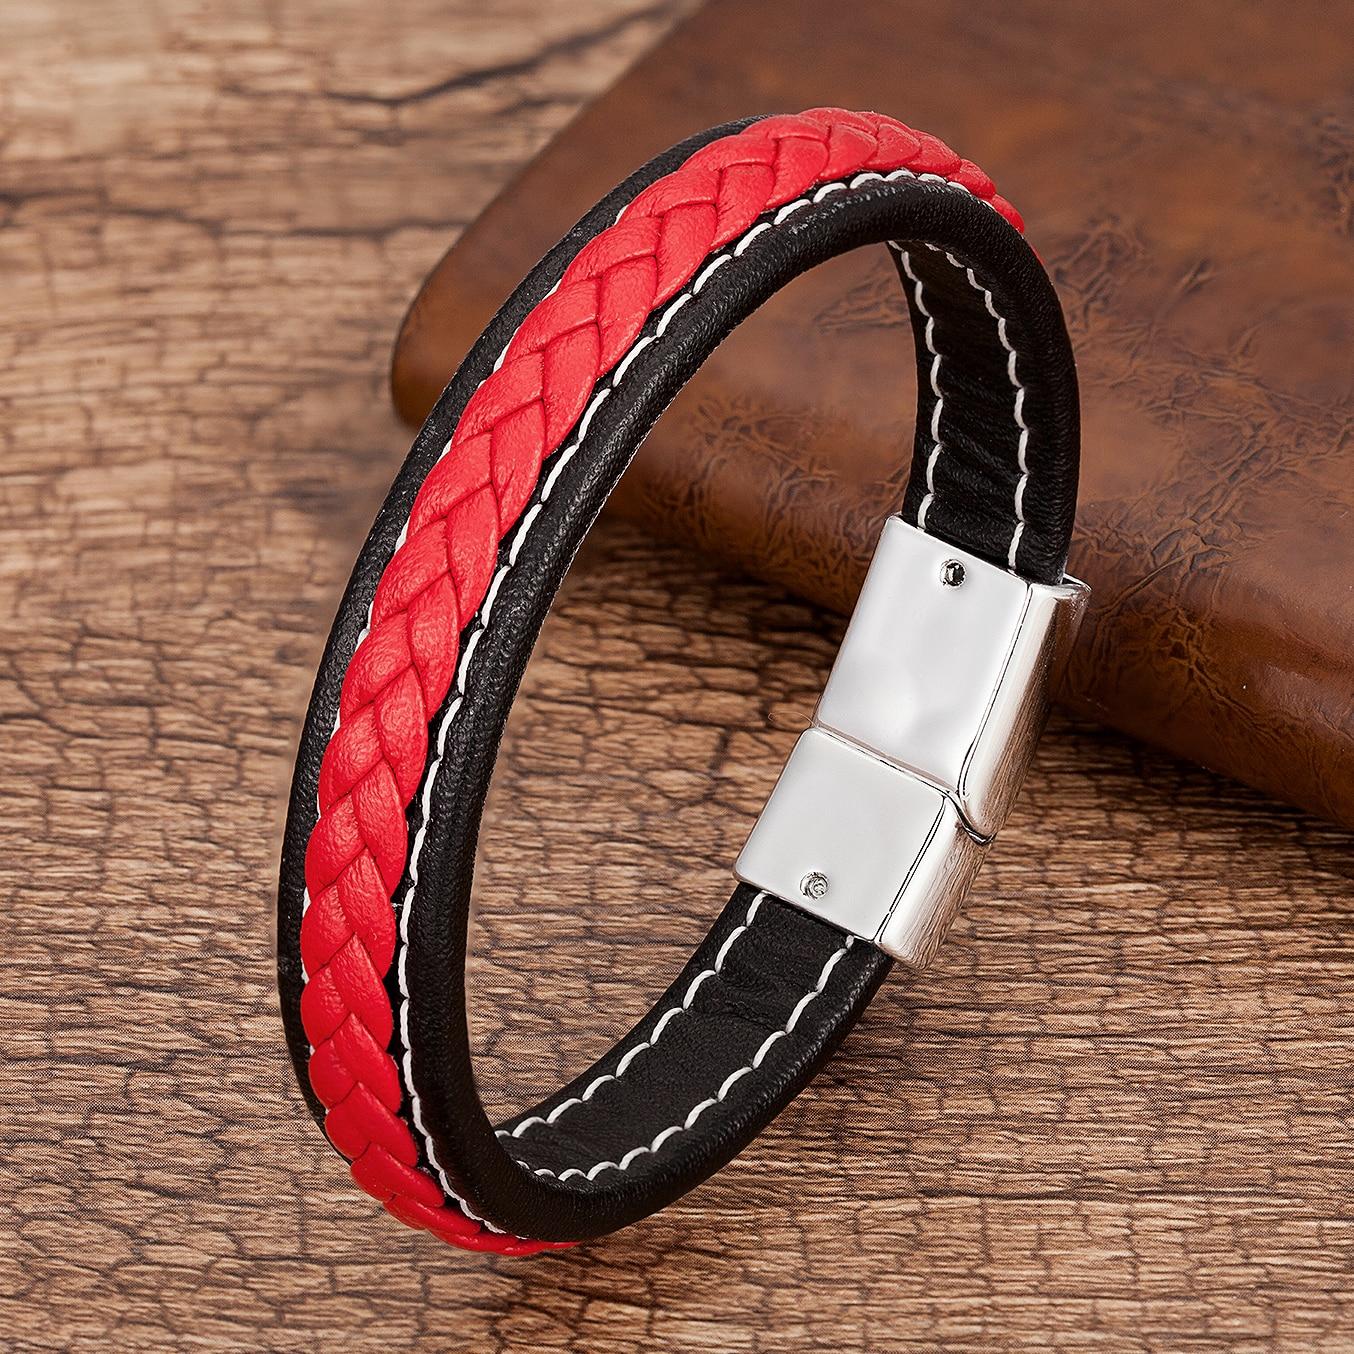 Punk Men Jewelry Red Black Braided Leather Bracelet Metal Magnetic Buckle Bracelets Charm Male Wrist Band Pulsera Hombre